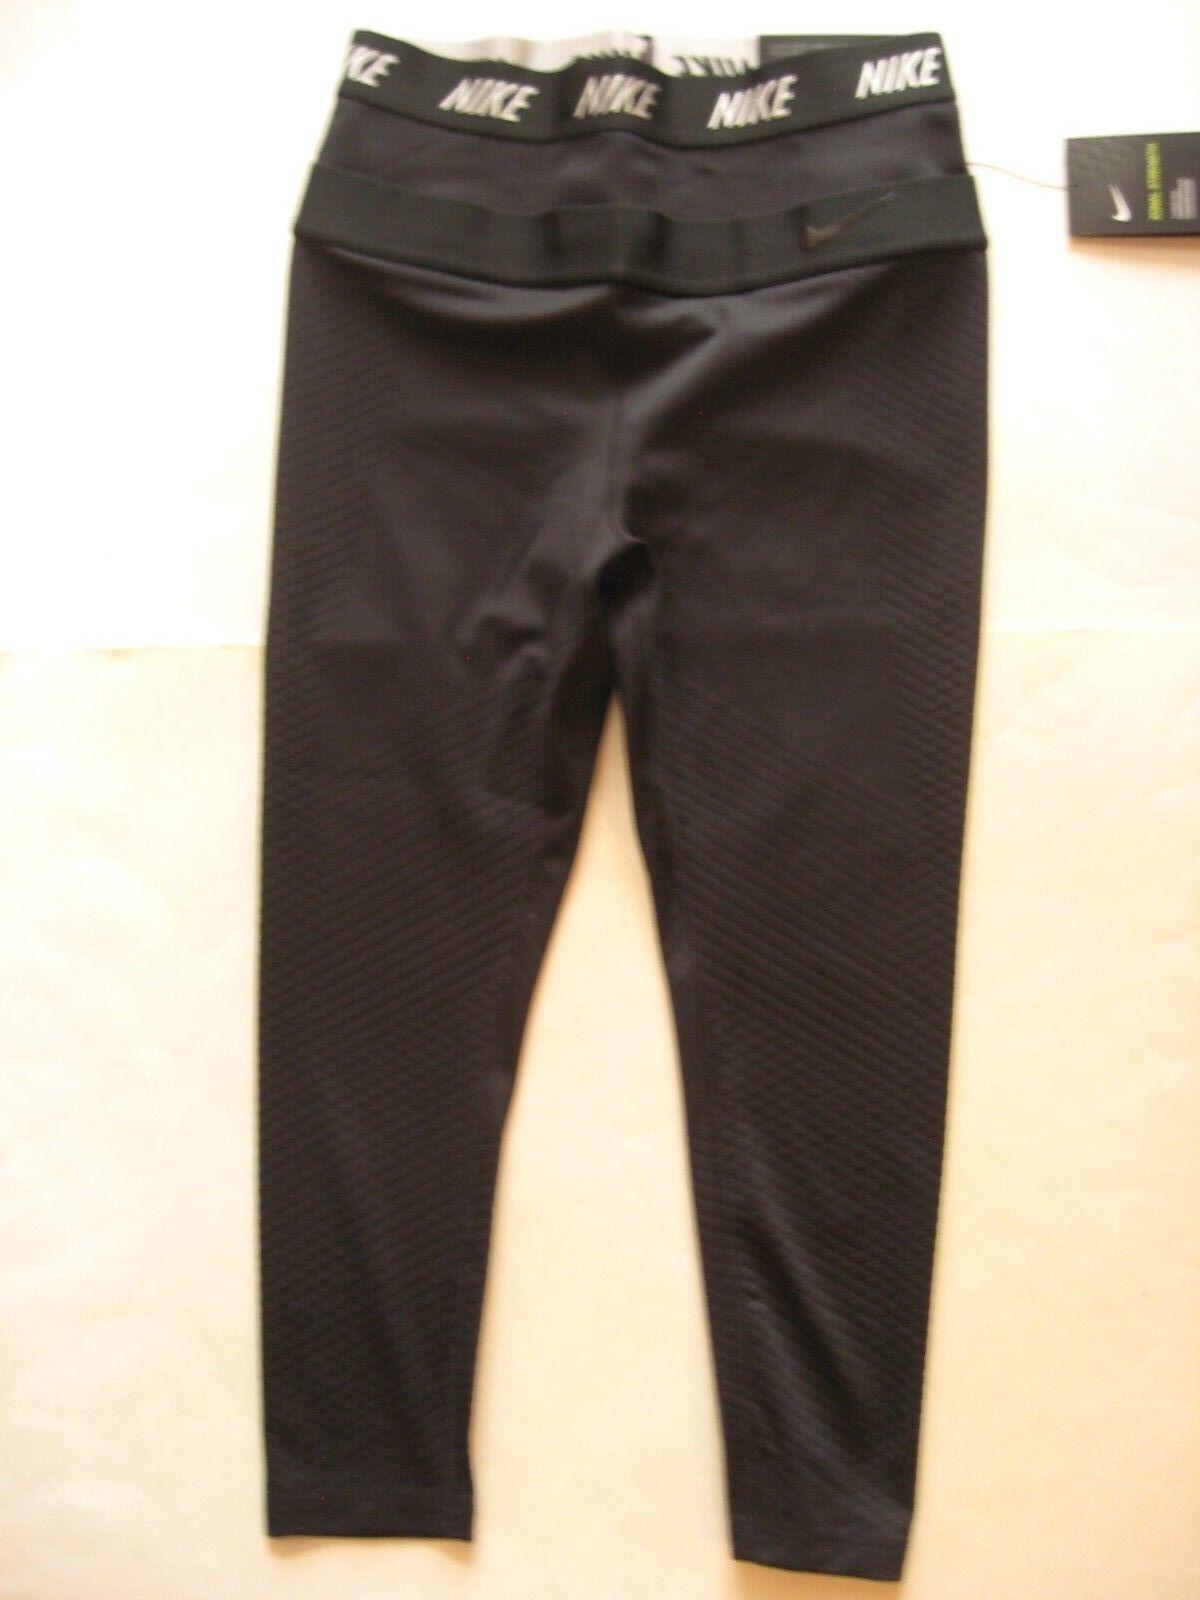 New NIKE ZONAL STRENGTH WOMEN'S HIGH RISE 21  TRAINING Capri Pants 861624-010 S